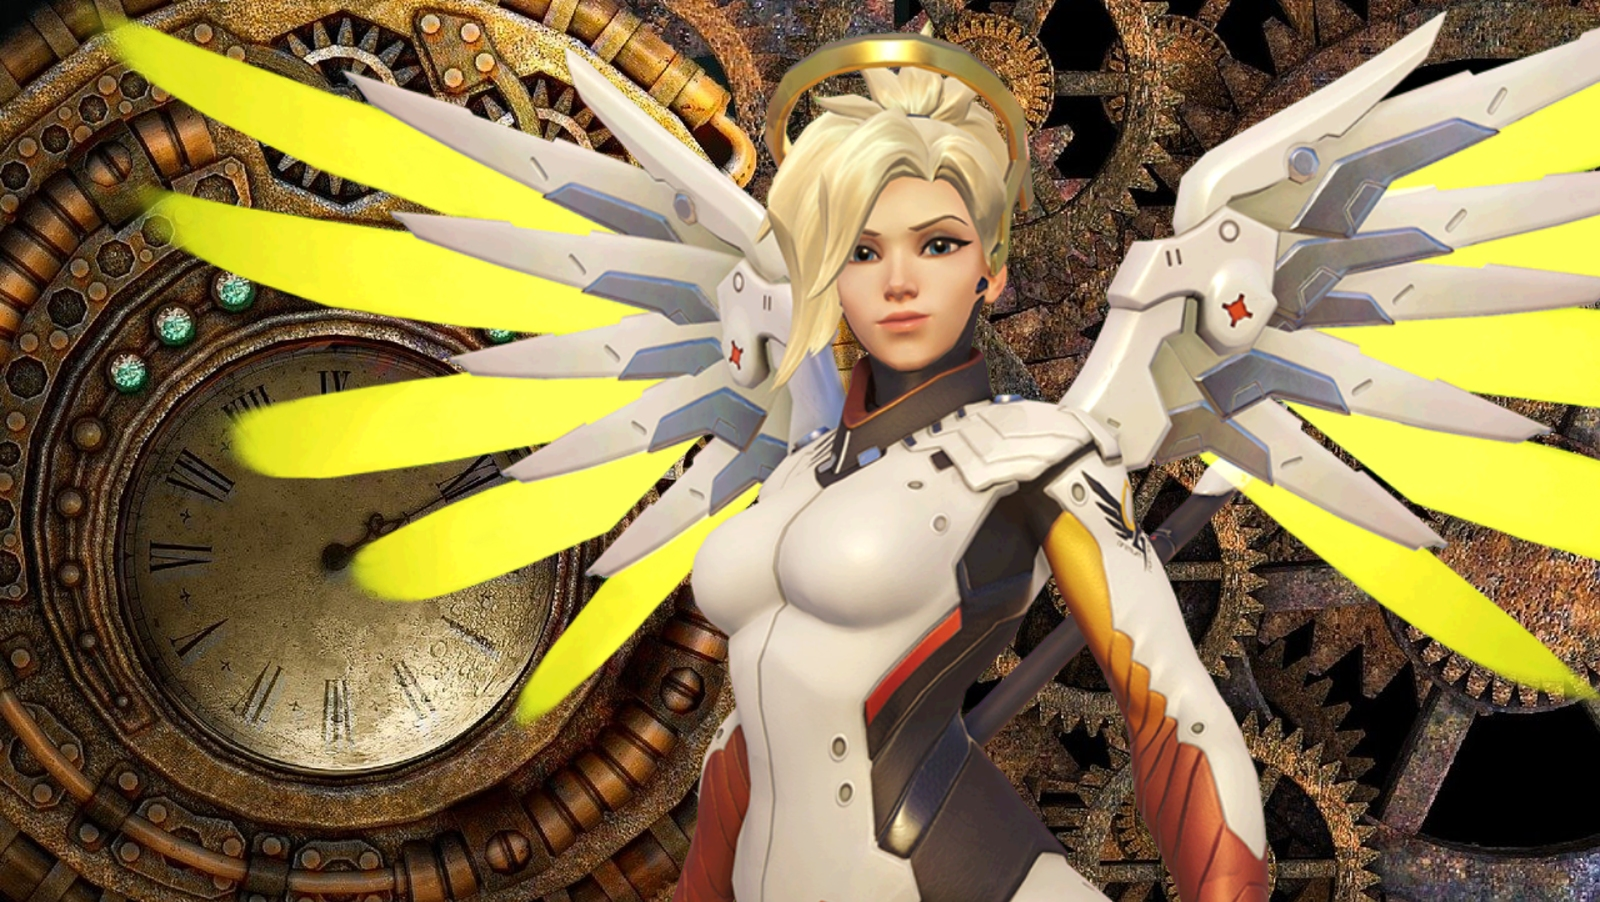 Steampunk Mercy Overwatch Concept Feature